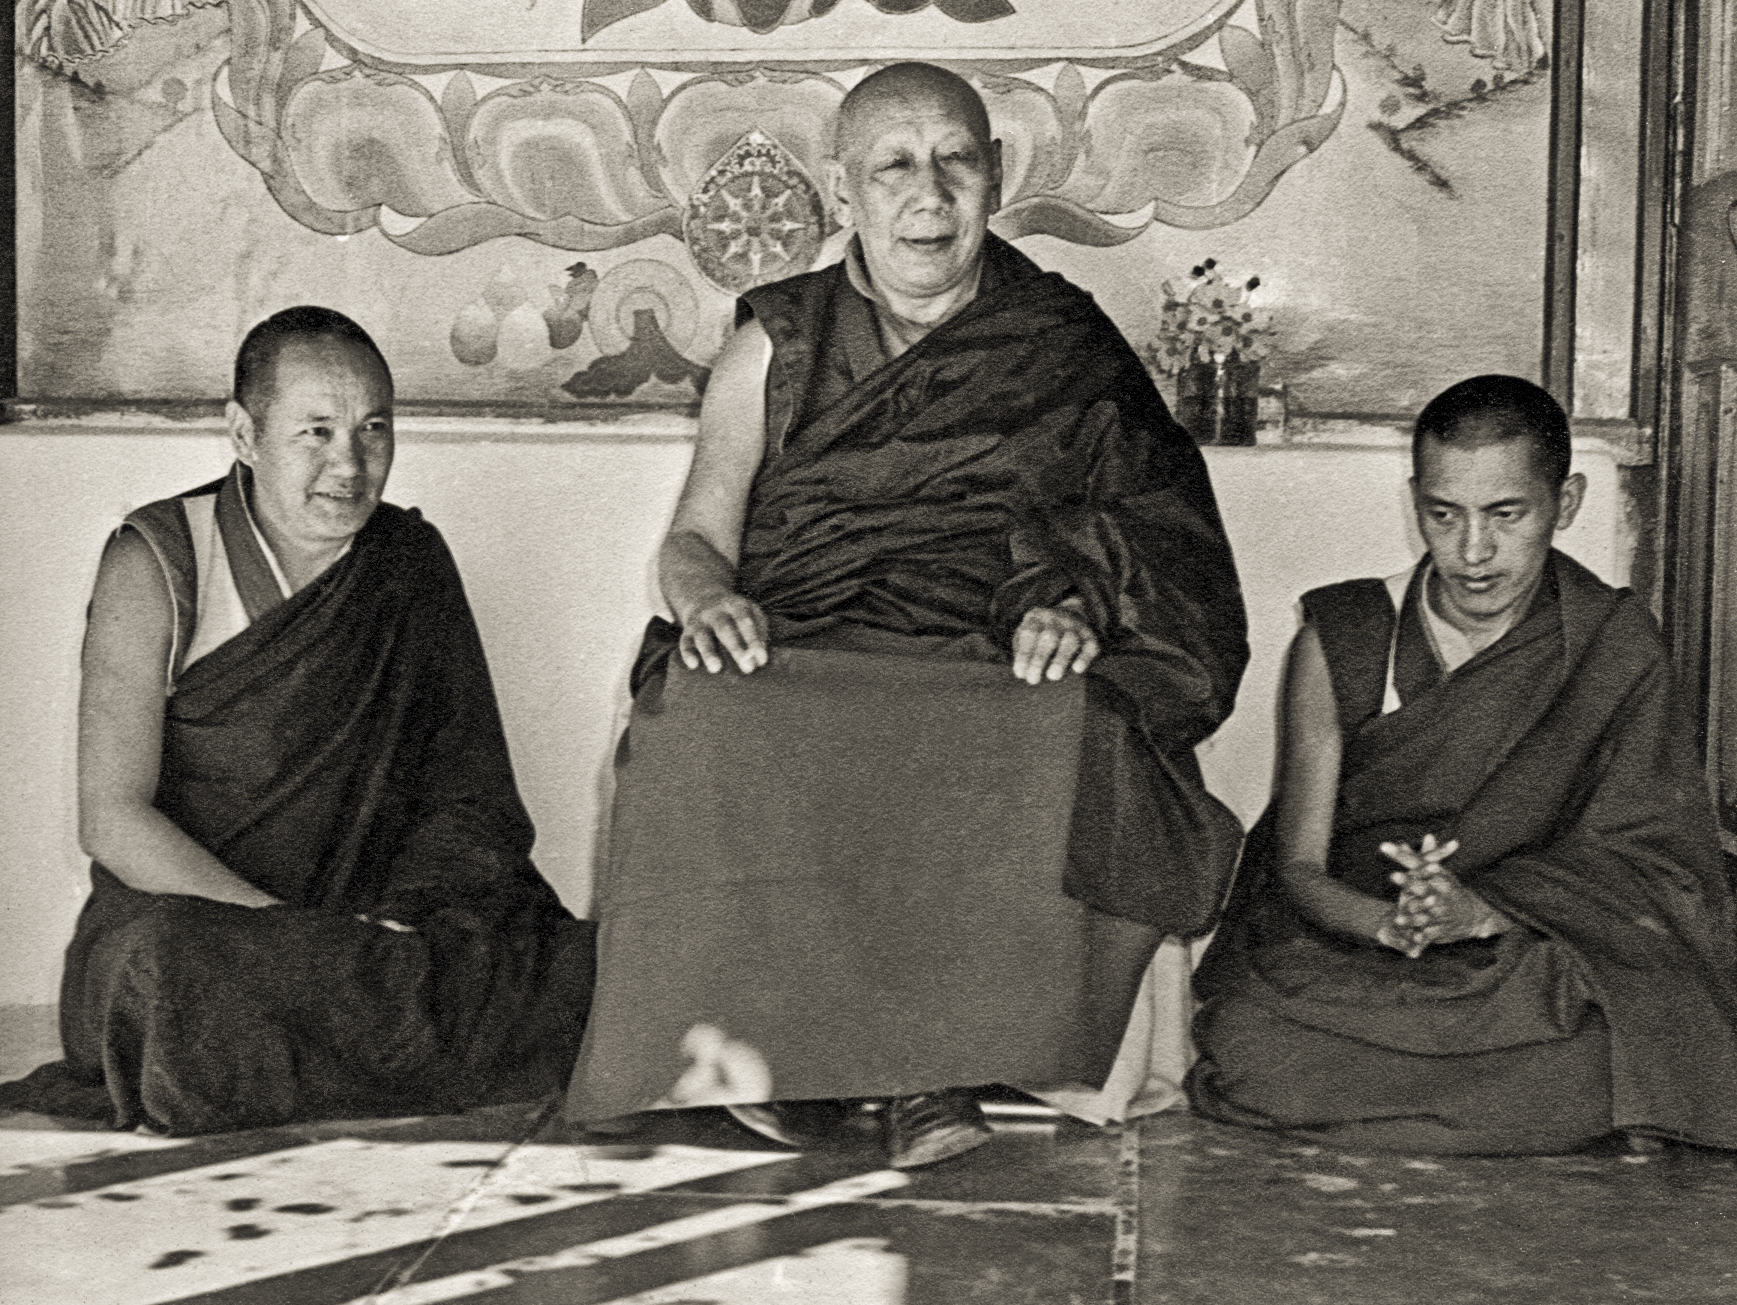 His Holiness Ling Rinpoche withLama Yeshe and Lama Zopa Rinpoche at Tushita Dharamsala in1975. (Photo Brian Beresford)